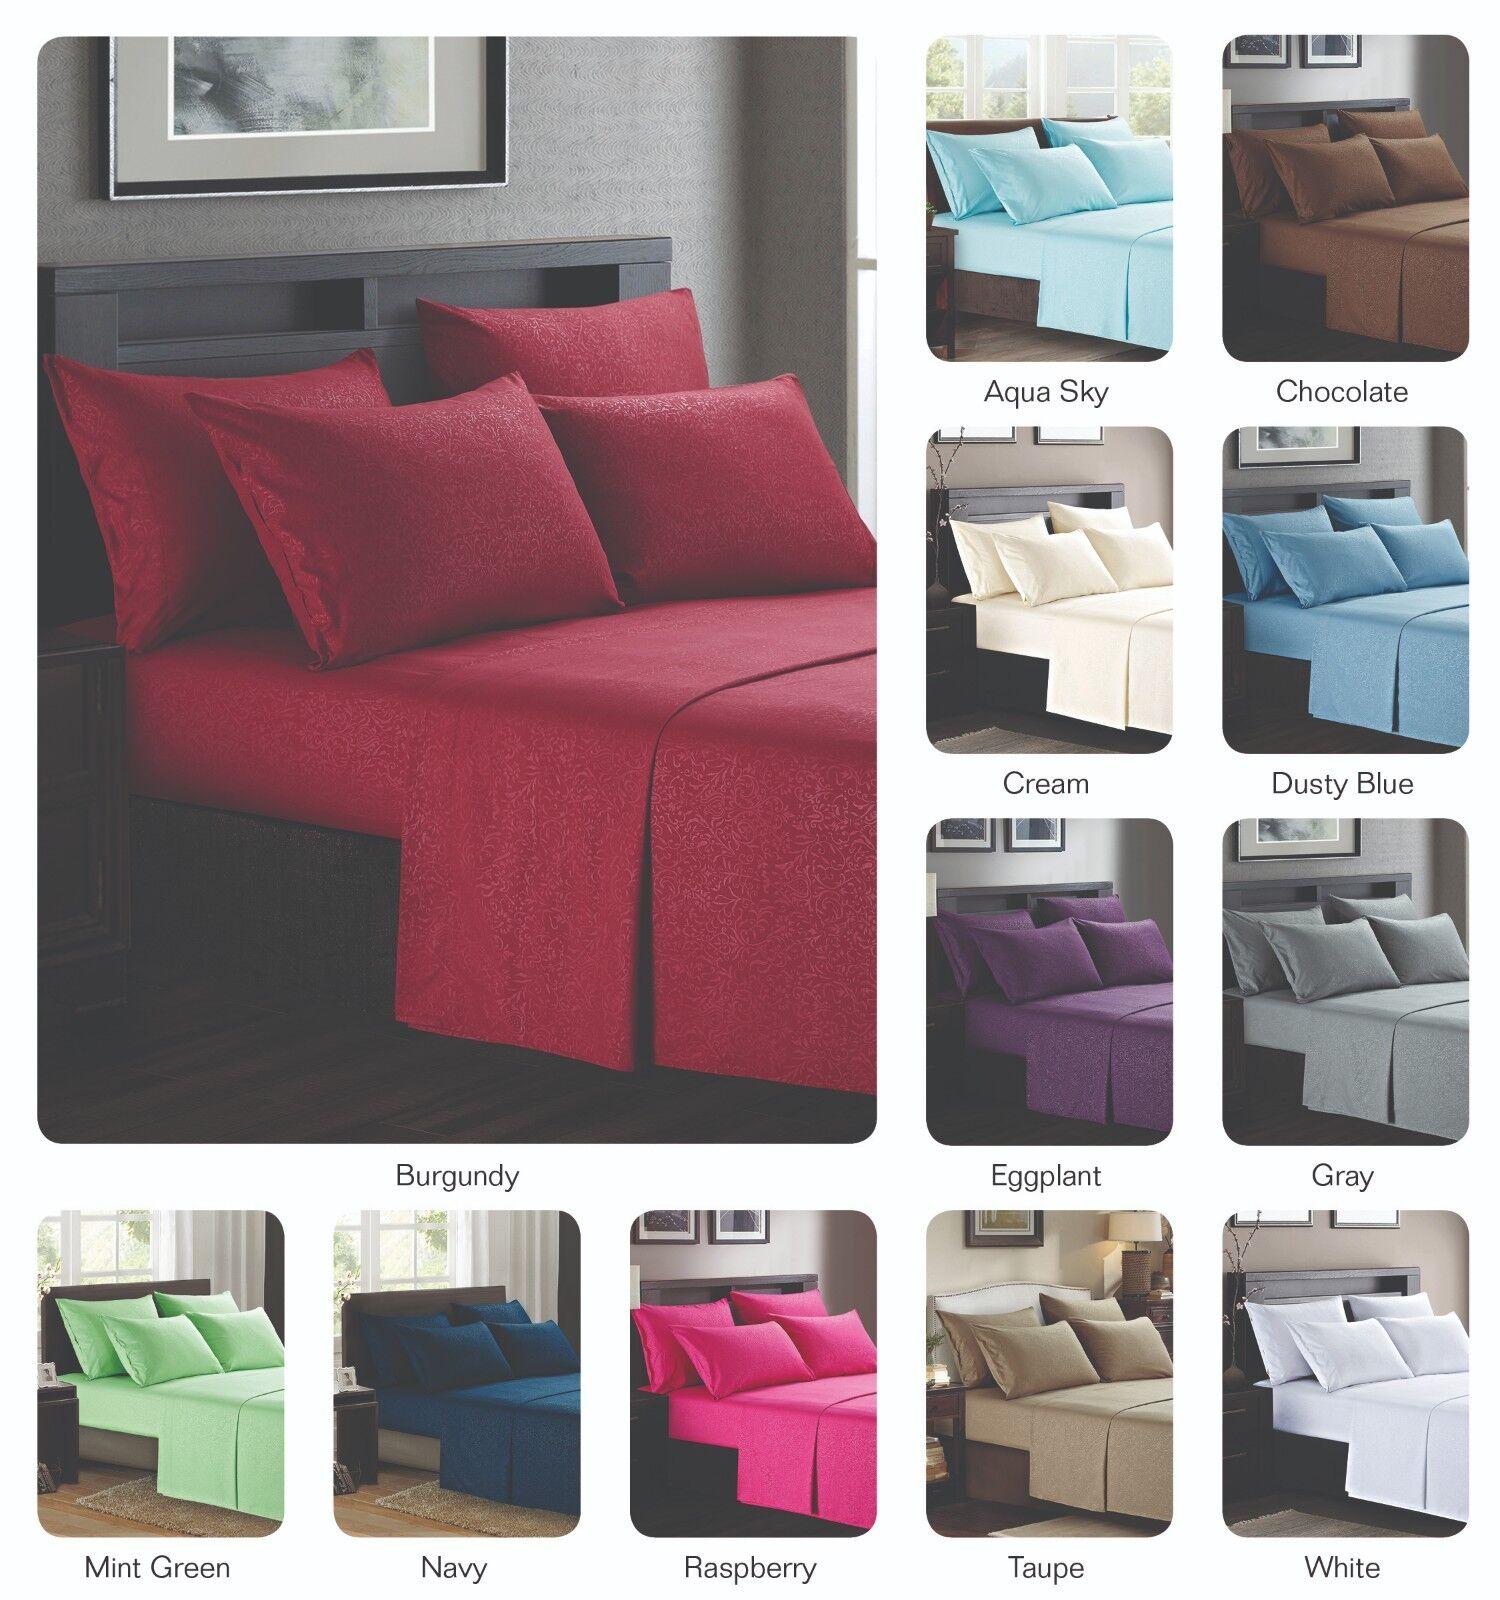 Platinum Hotel Quality Embossed King Sheet Set w  4 Pillow Cases Cream Egg Shell